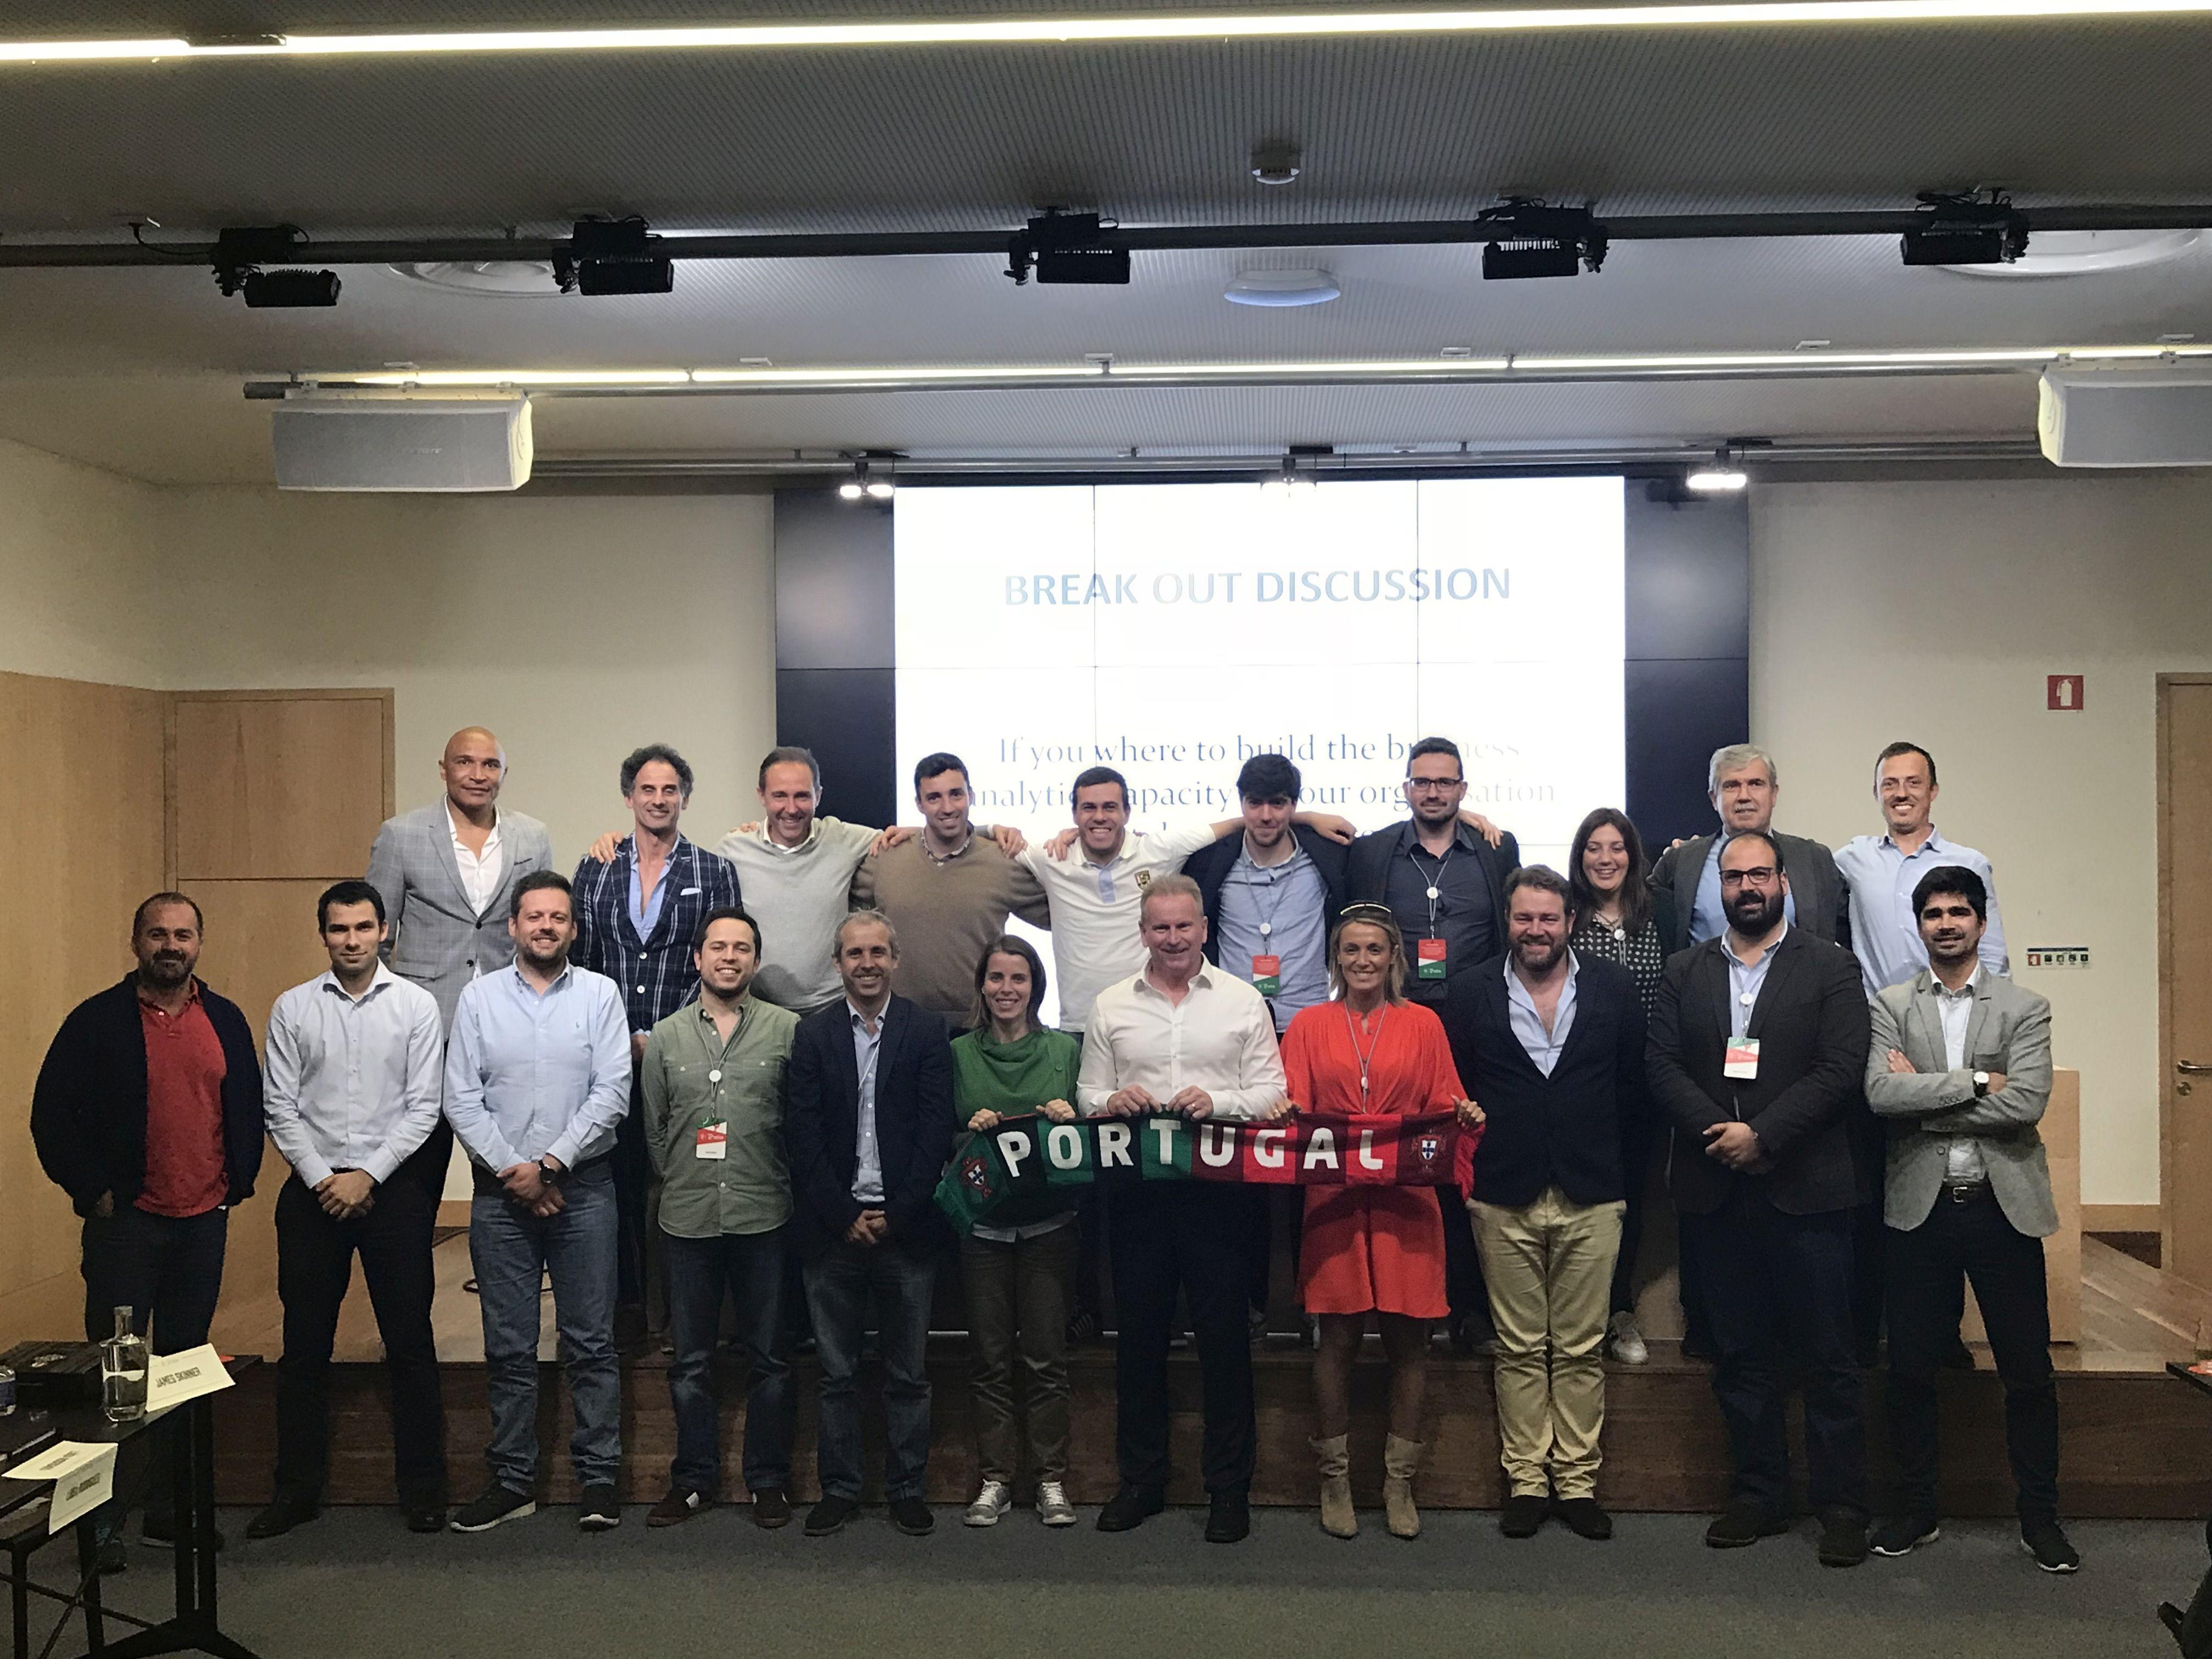 Portuguese Football Federation workshop on Marketing  Analytics